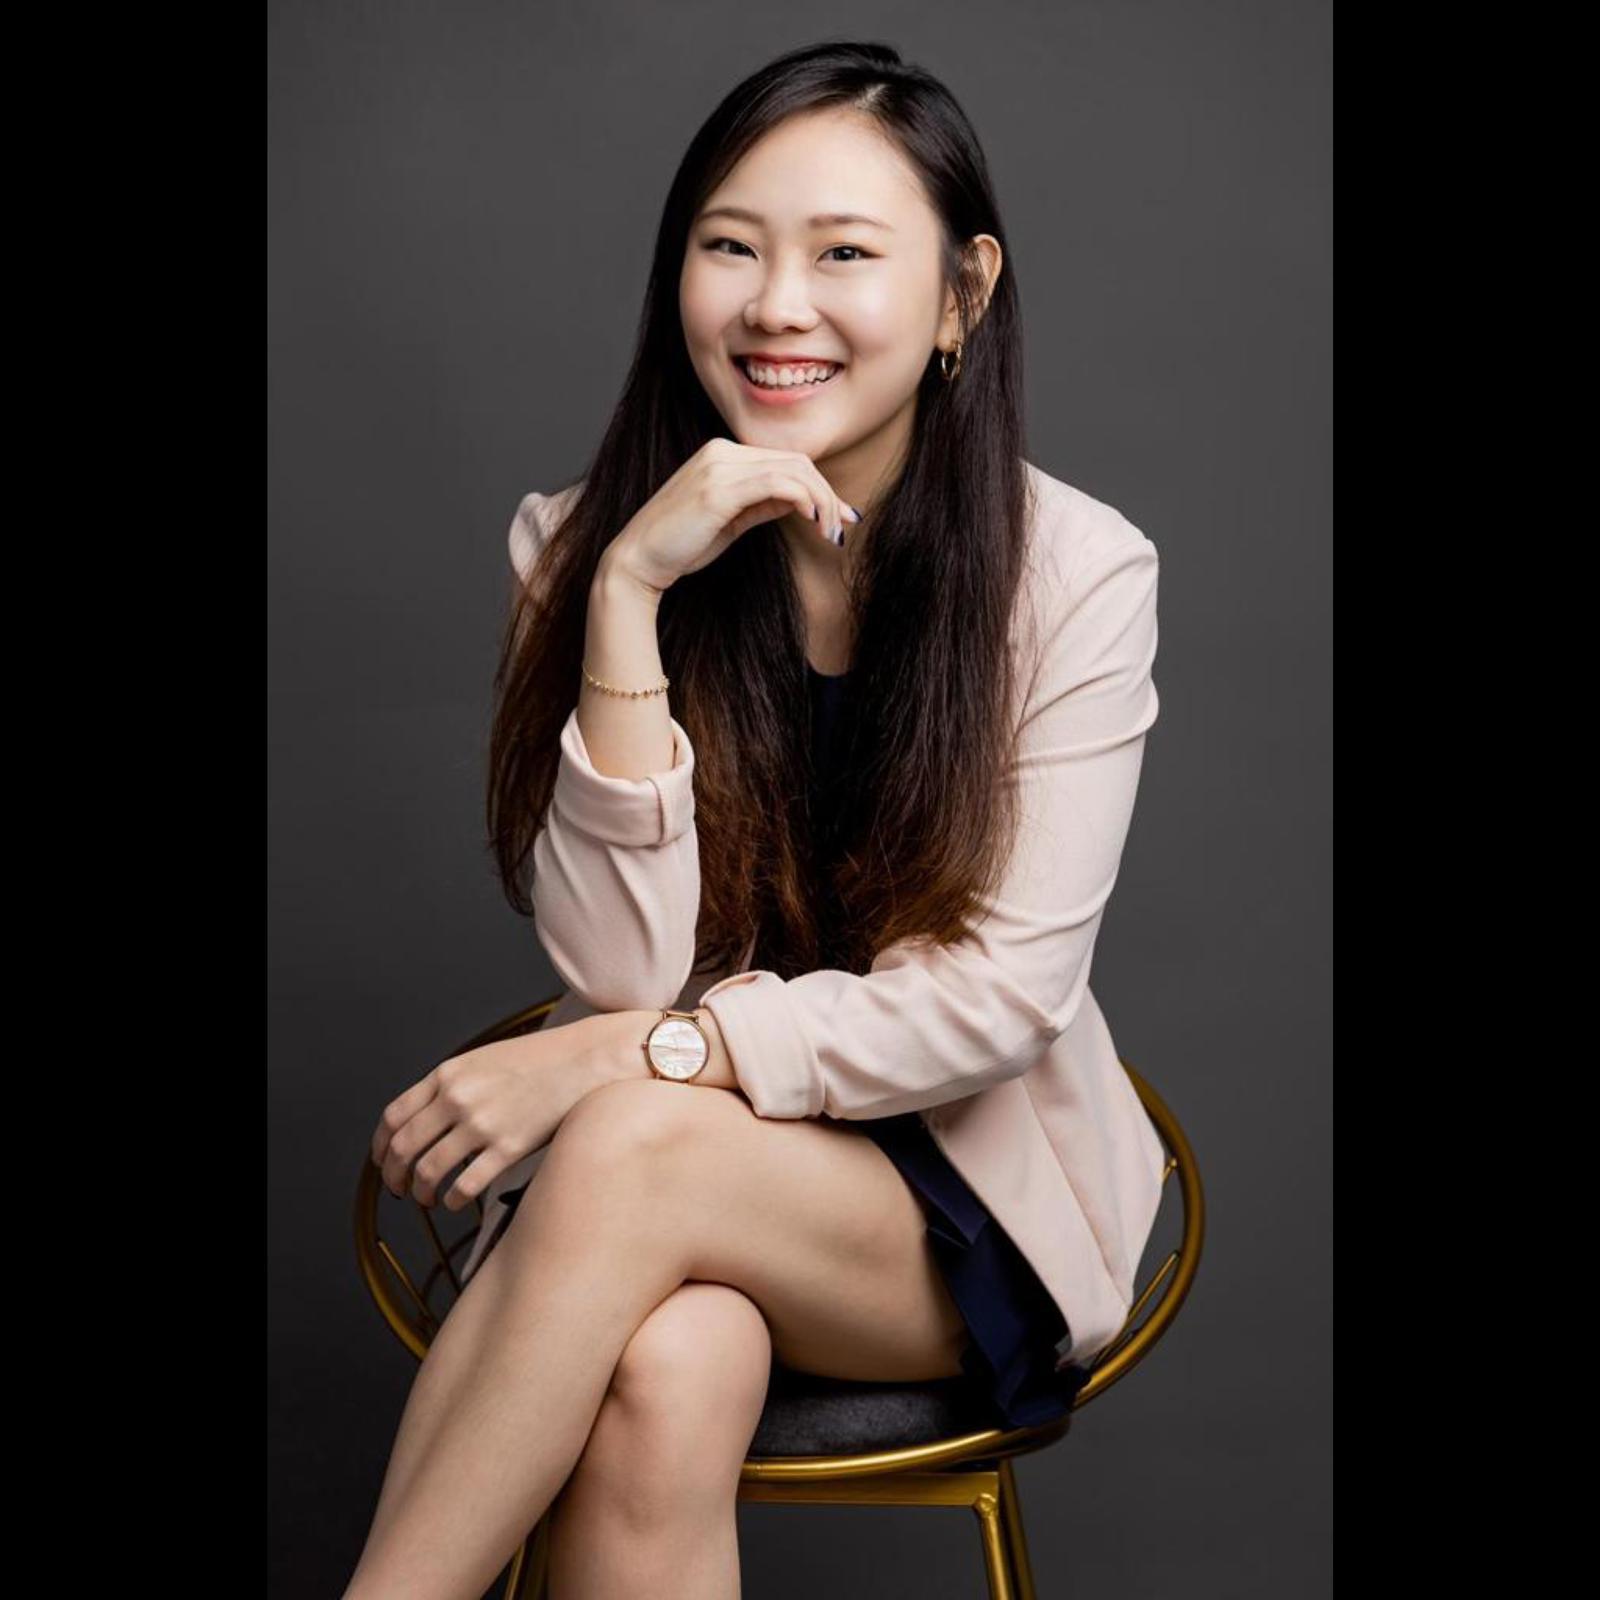 Chua Weilin